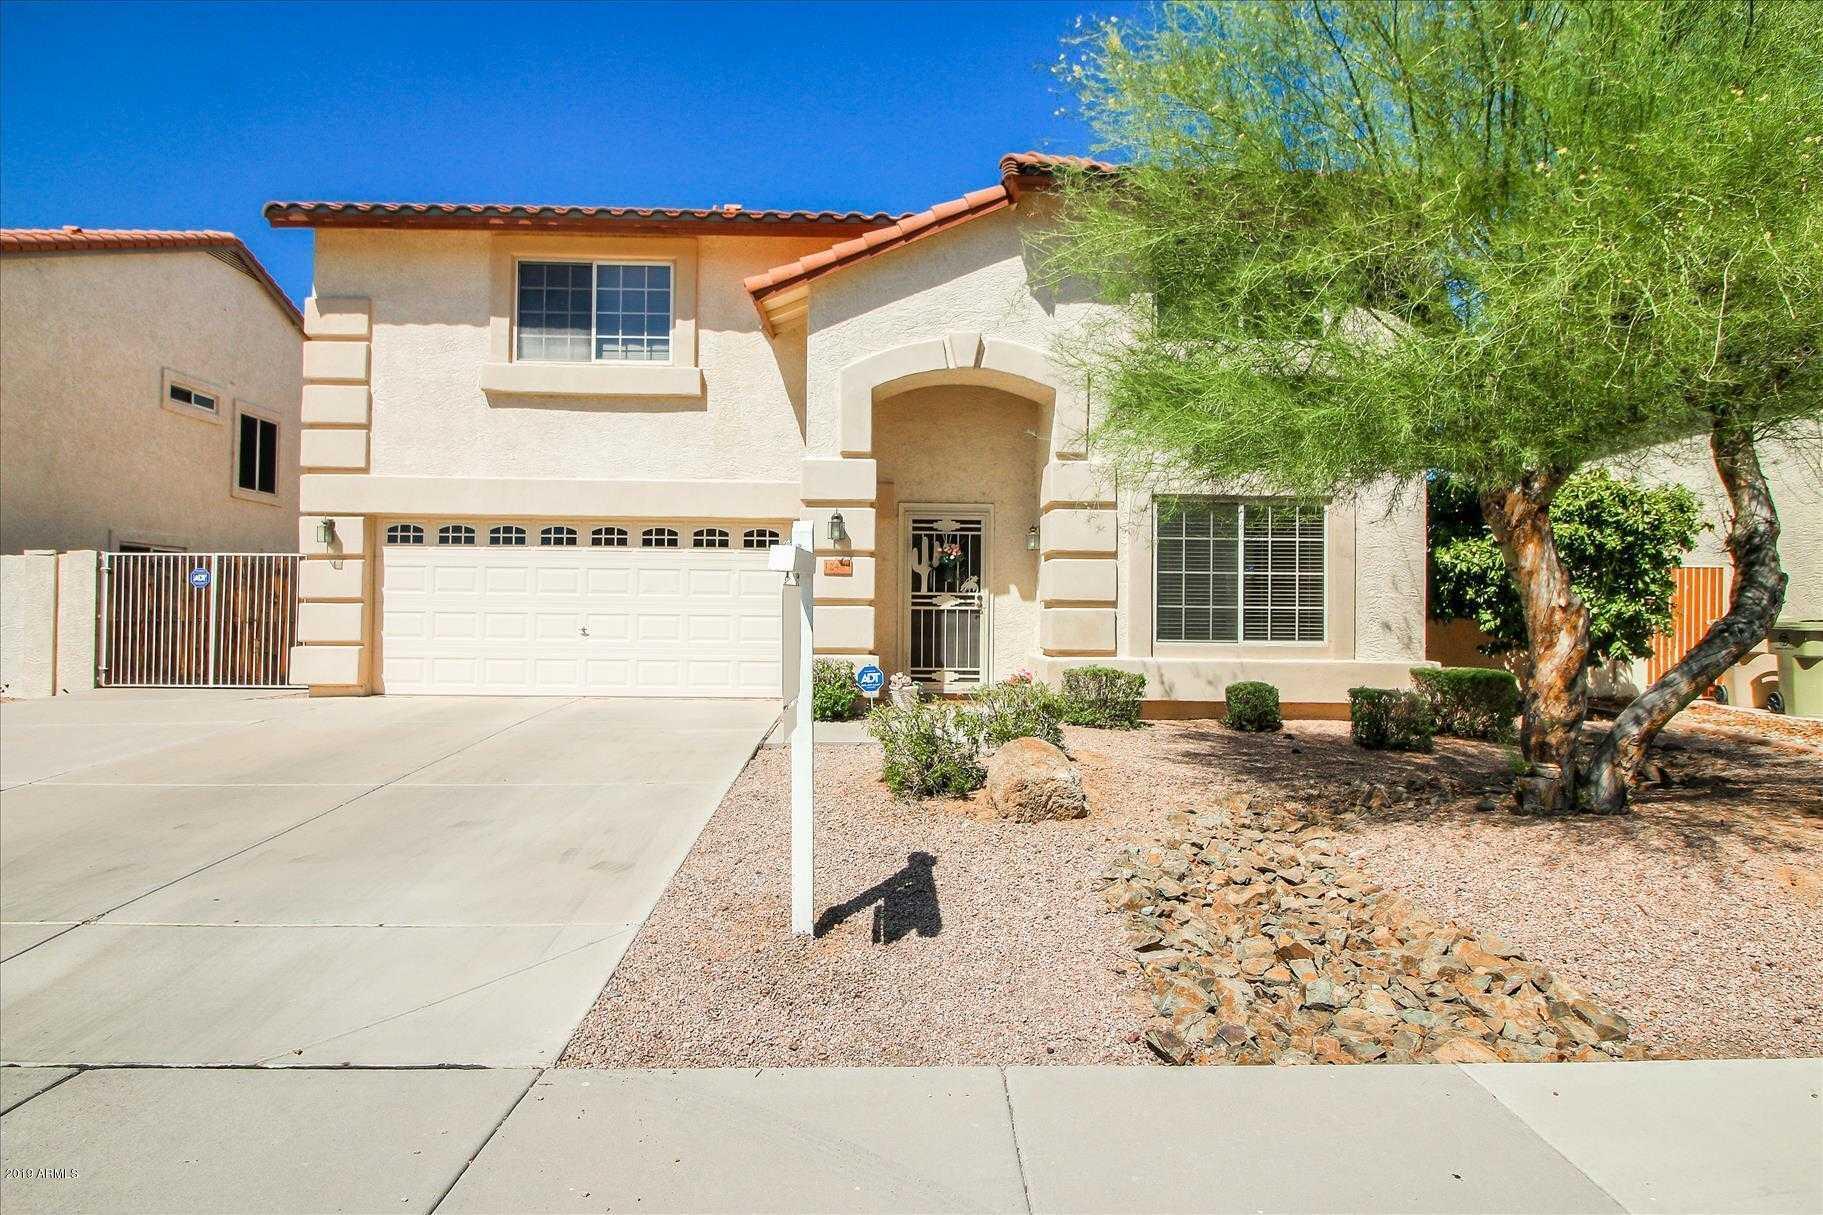 $329,500 - 4Br/3Ba - Home for Sale in Mission Groves 4 & 5, Glendale